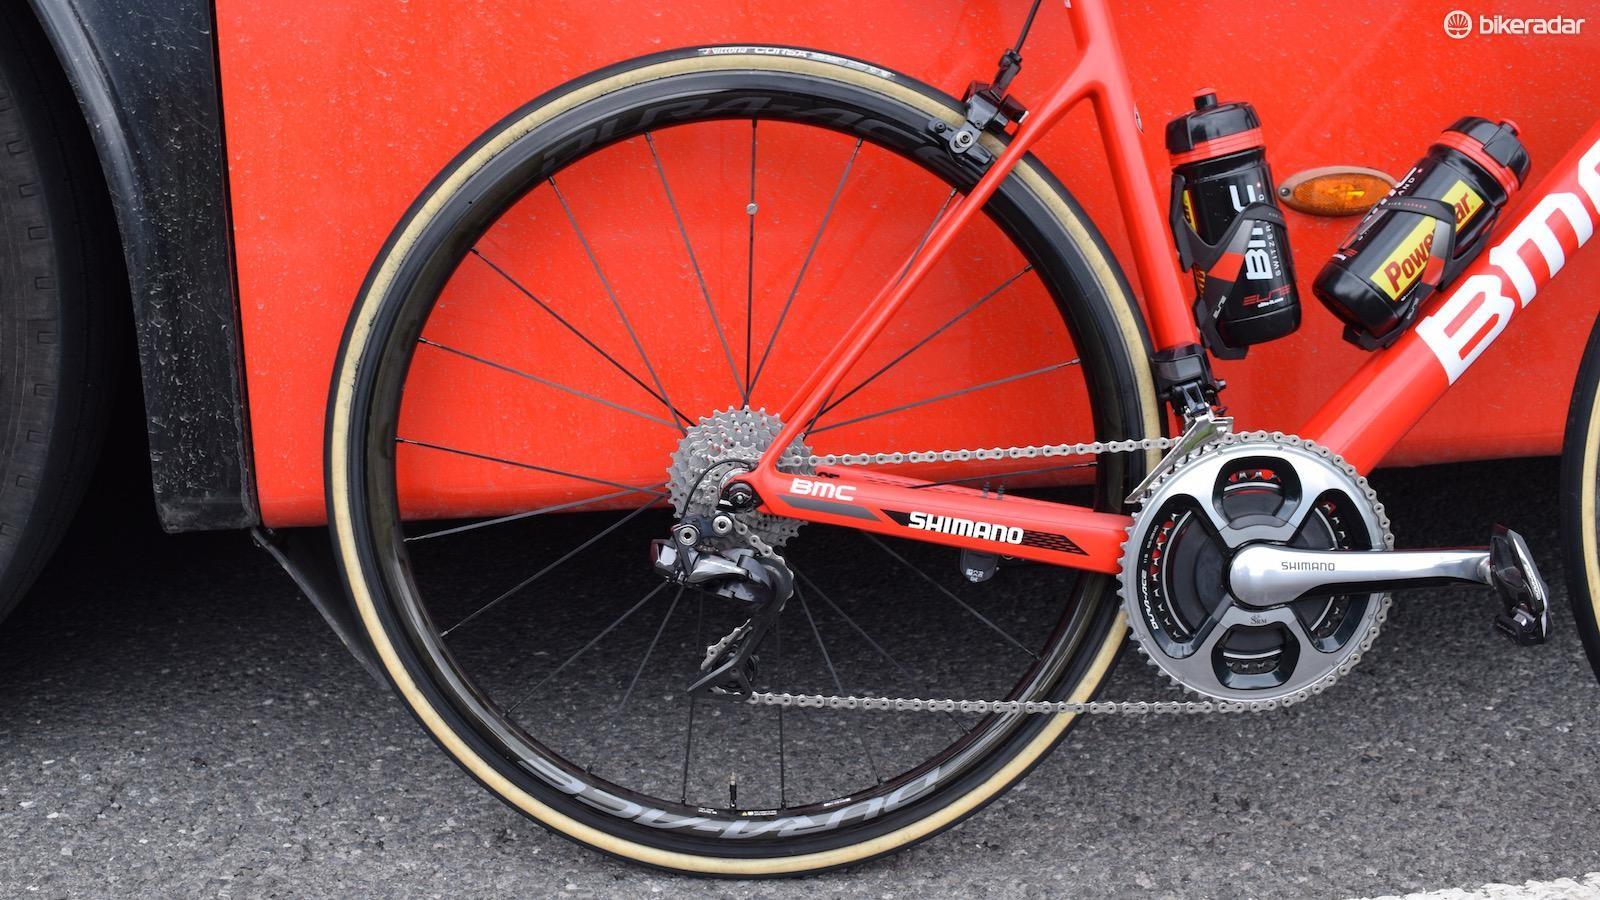 The entire BMC Racing team was running Dura-Ace 9100 series wheels